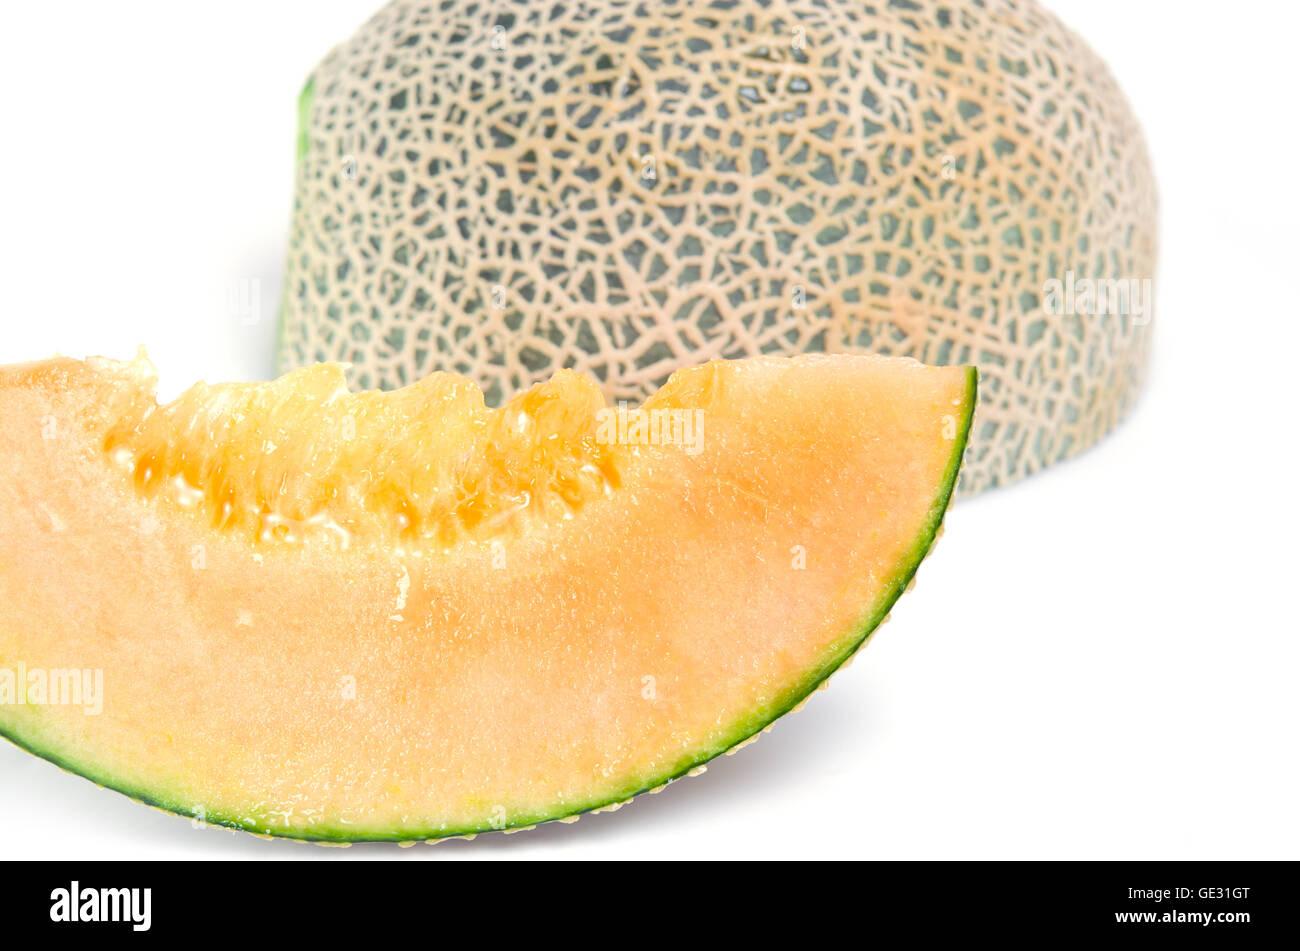 Cucumis melo melon ou en bac acier série (d'autres noms sont cantelope, cantaloup, melon miel, Crenshaw, Photo Stock